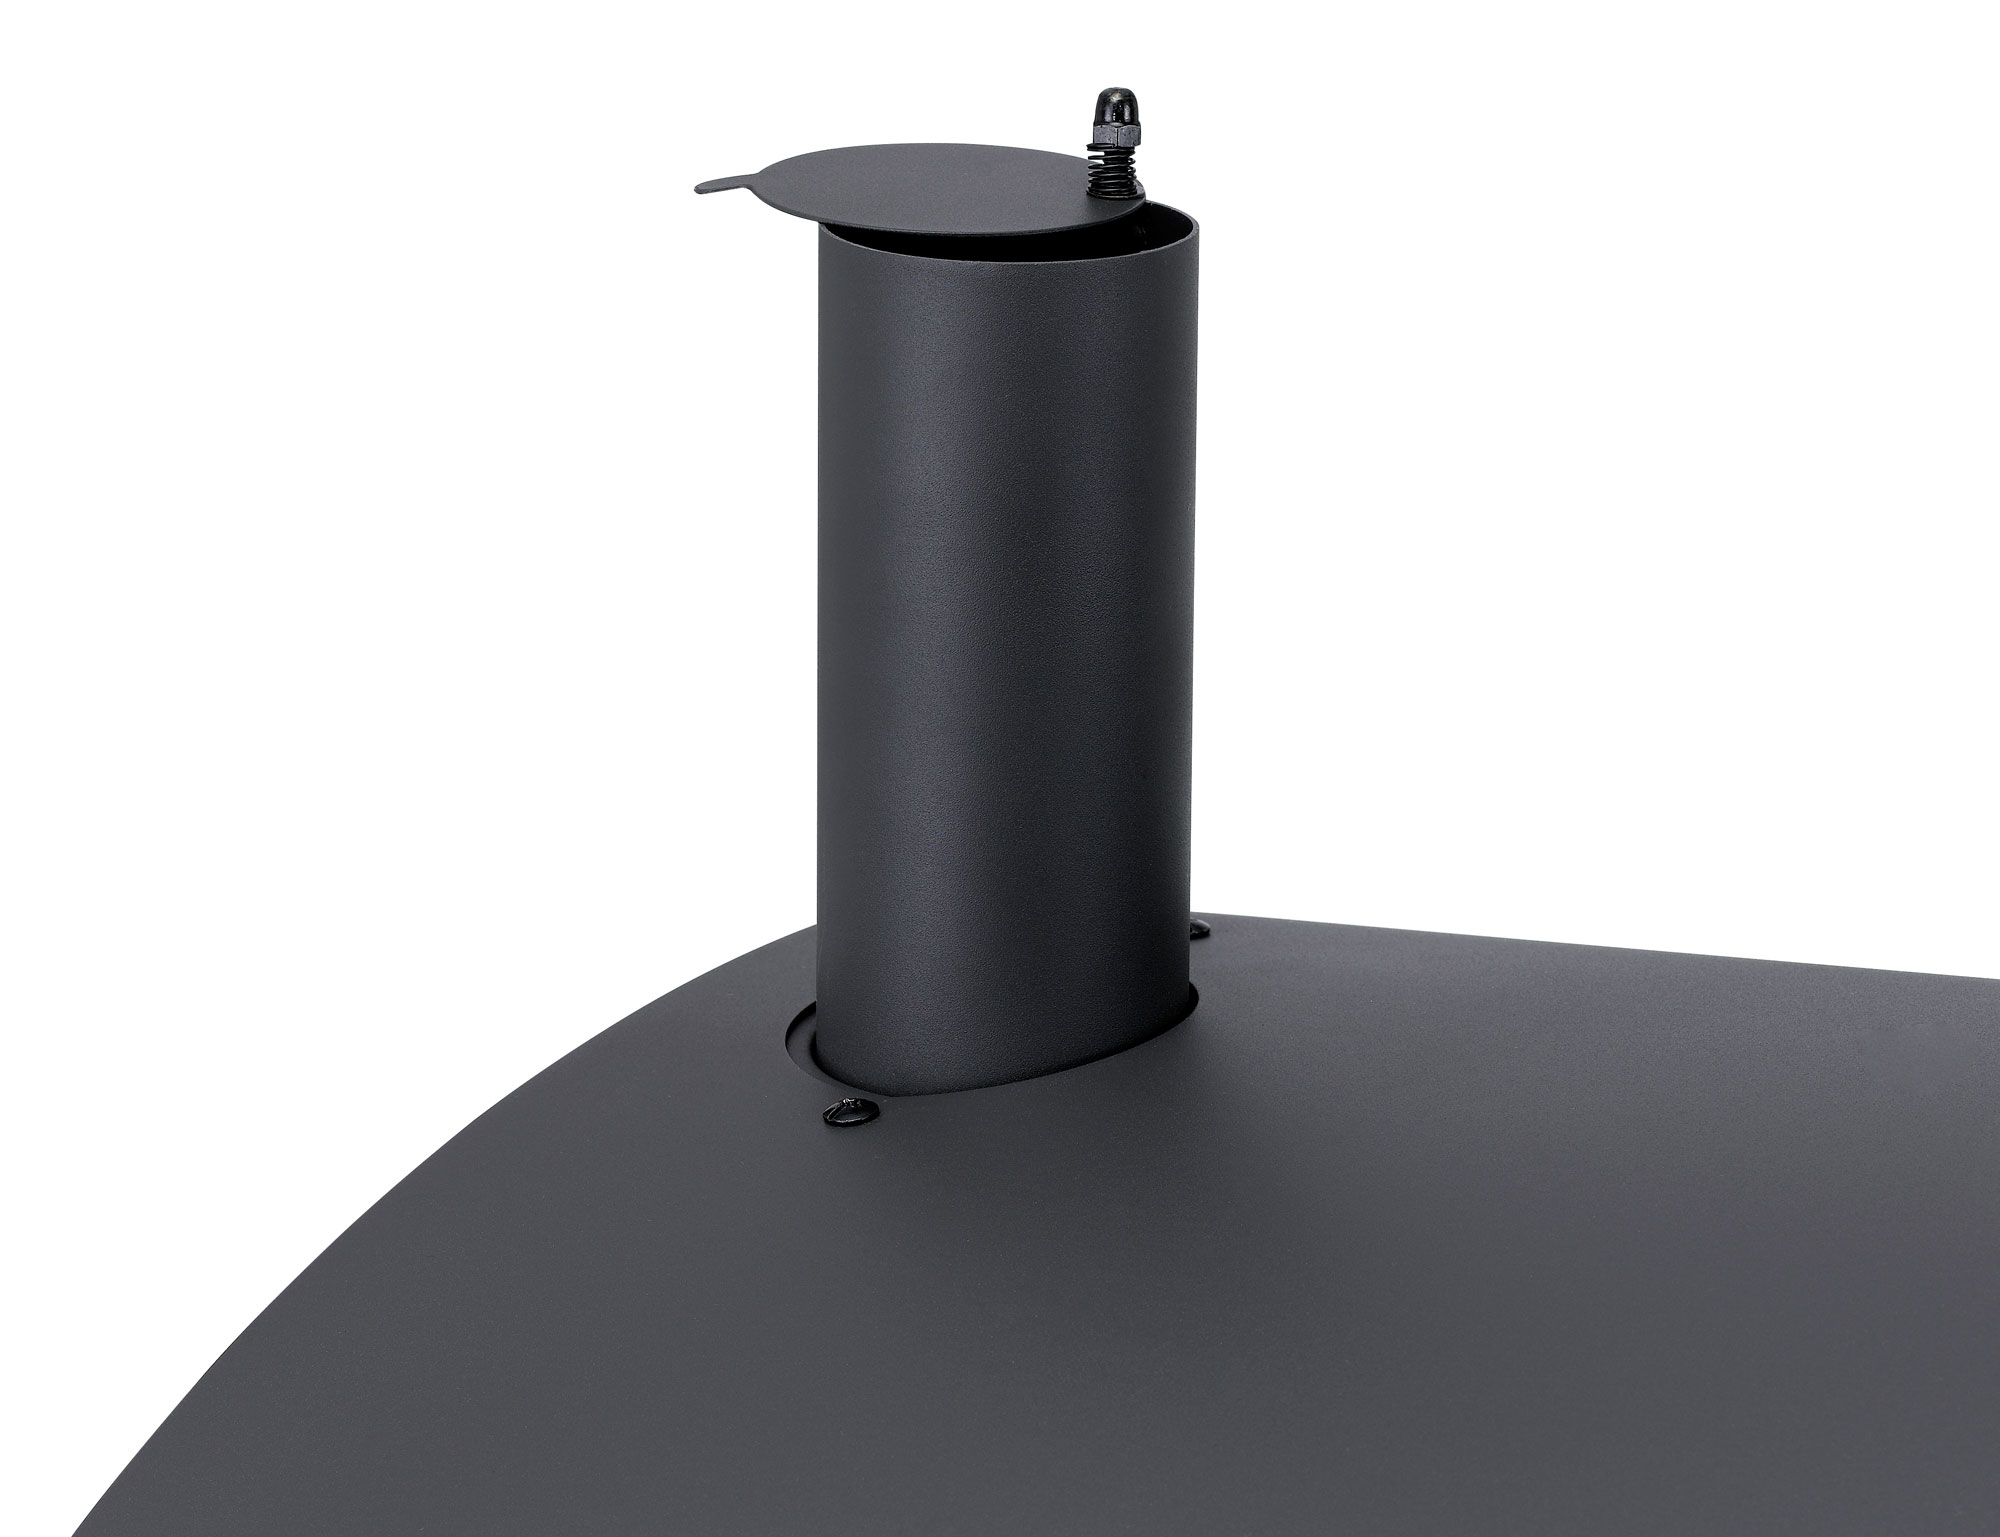 Tepro Toronto Xxl Holzkohlegrill Abdeckung : Tepro holzkohlegrill grillwagen toronto xxl grillfläche cm